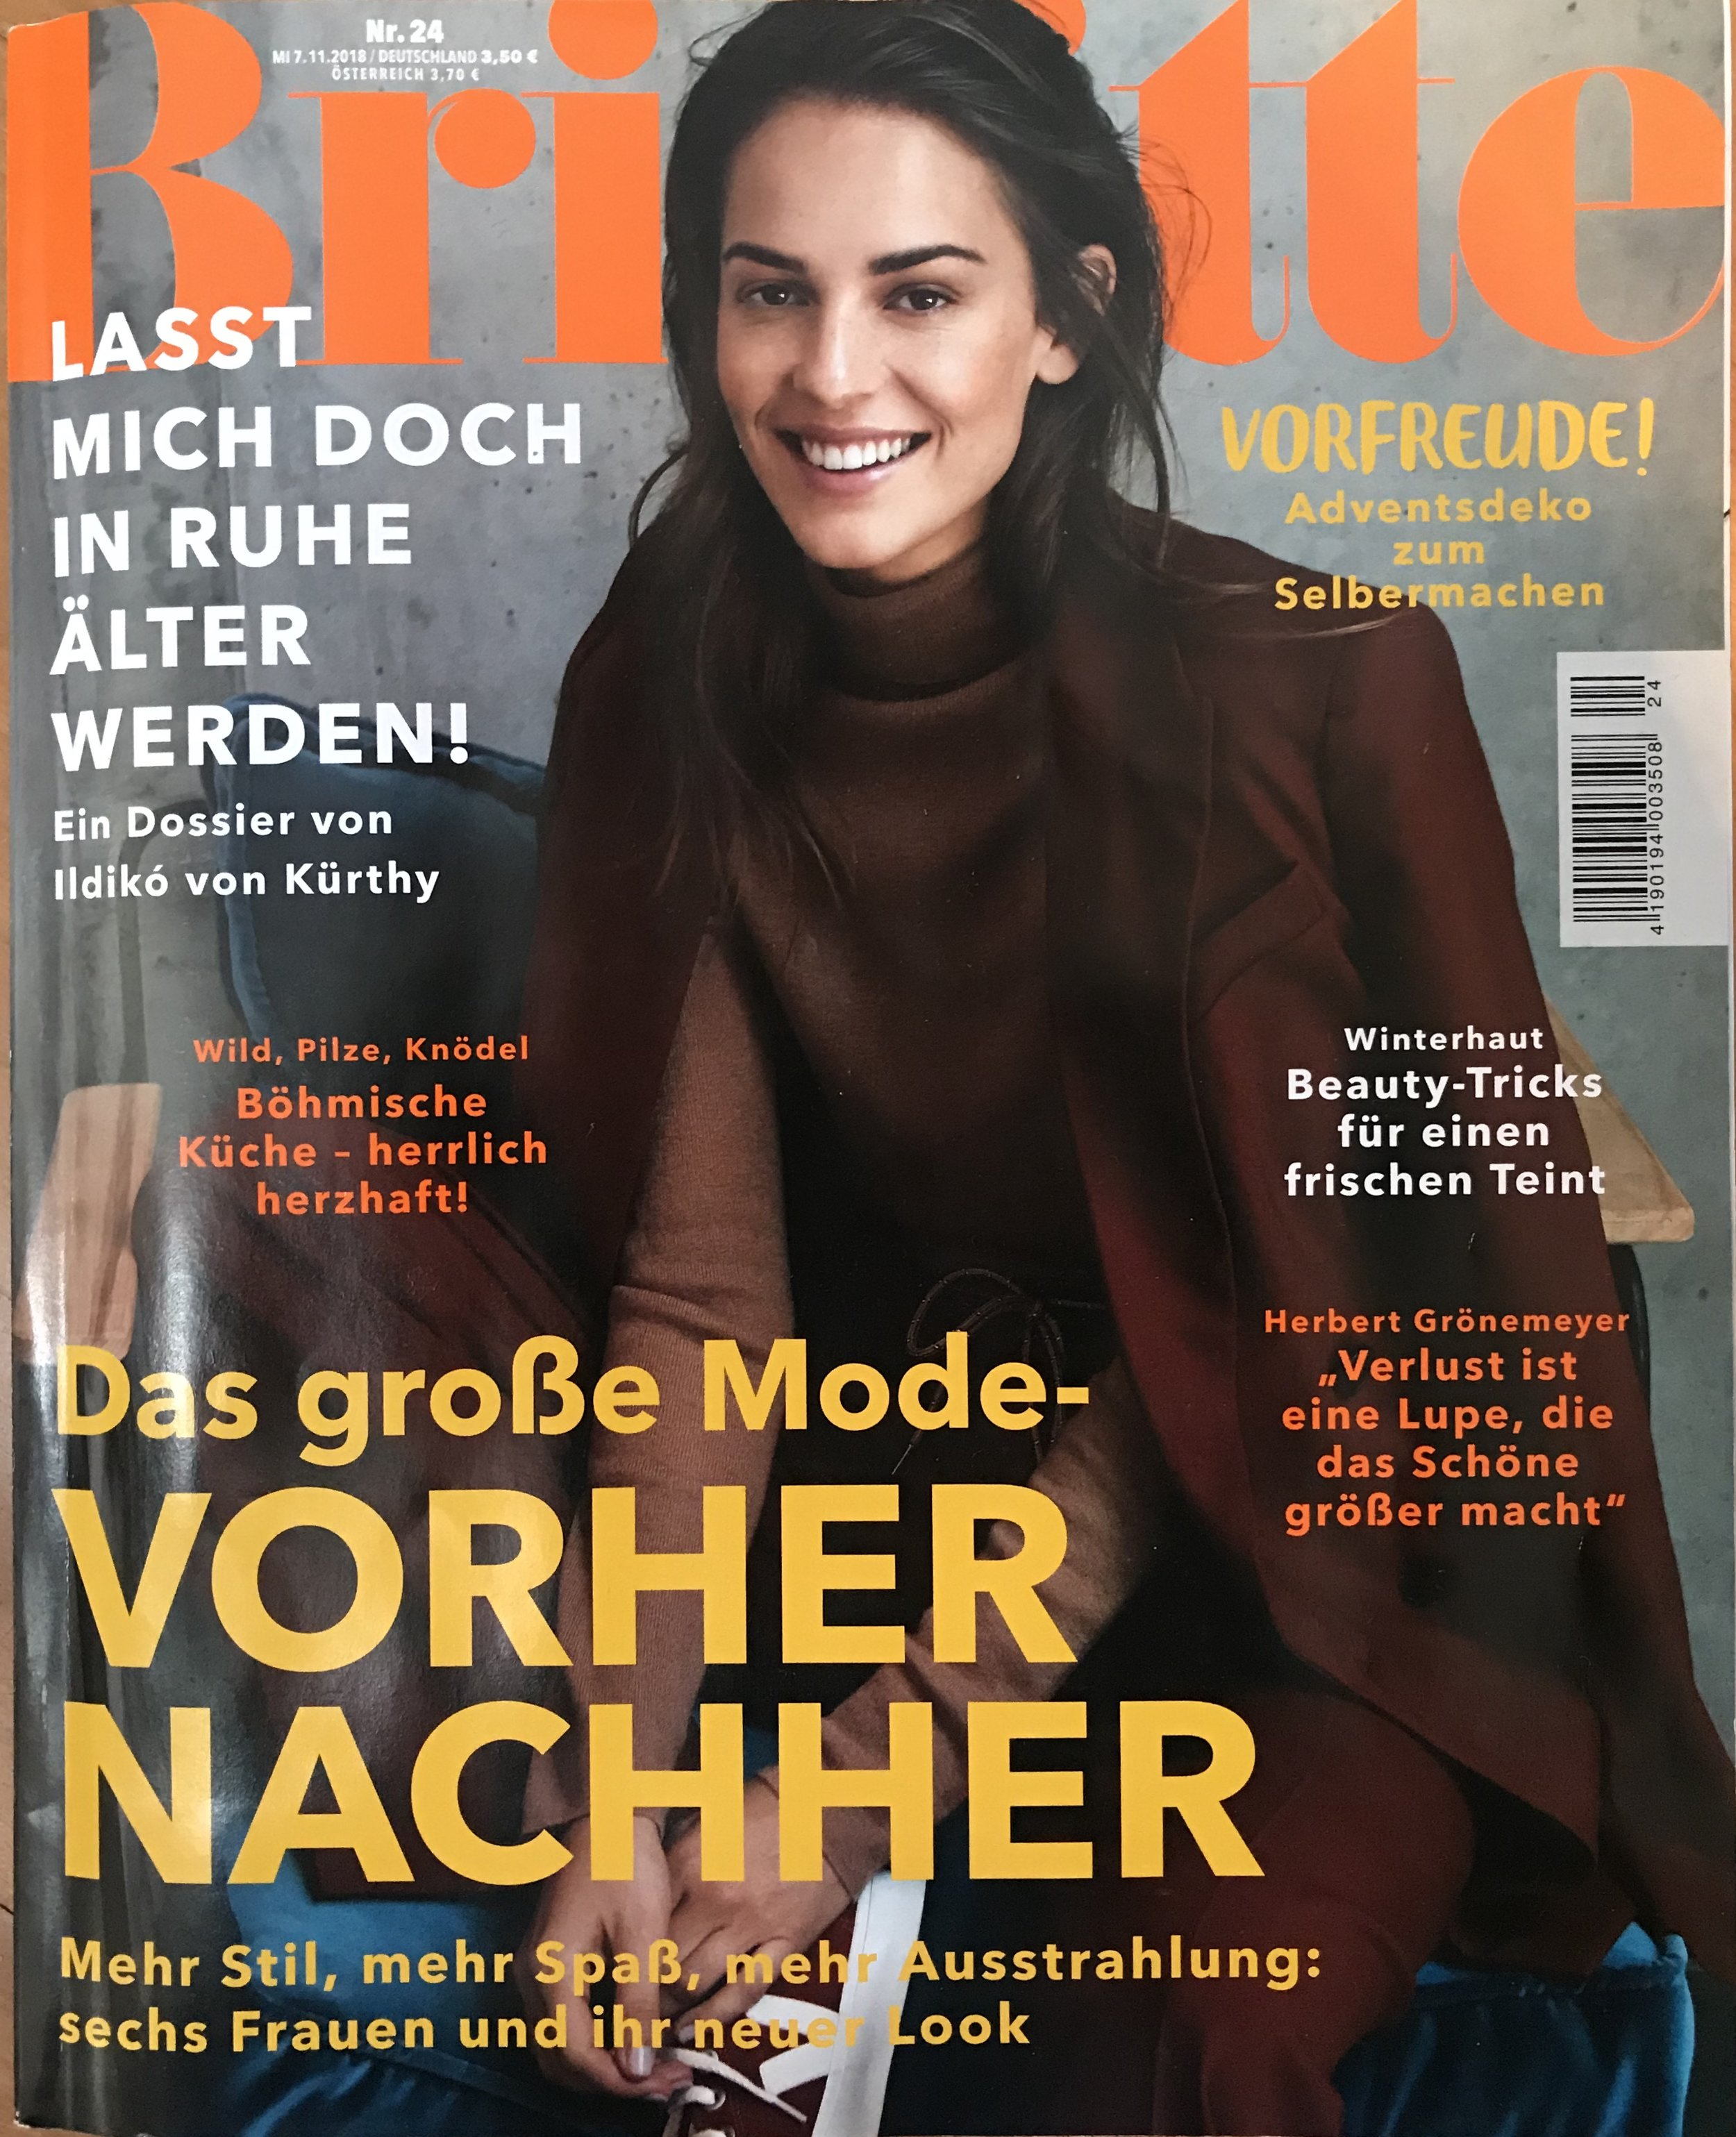 Brigitte Nr 24, November 2018